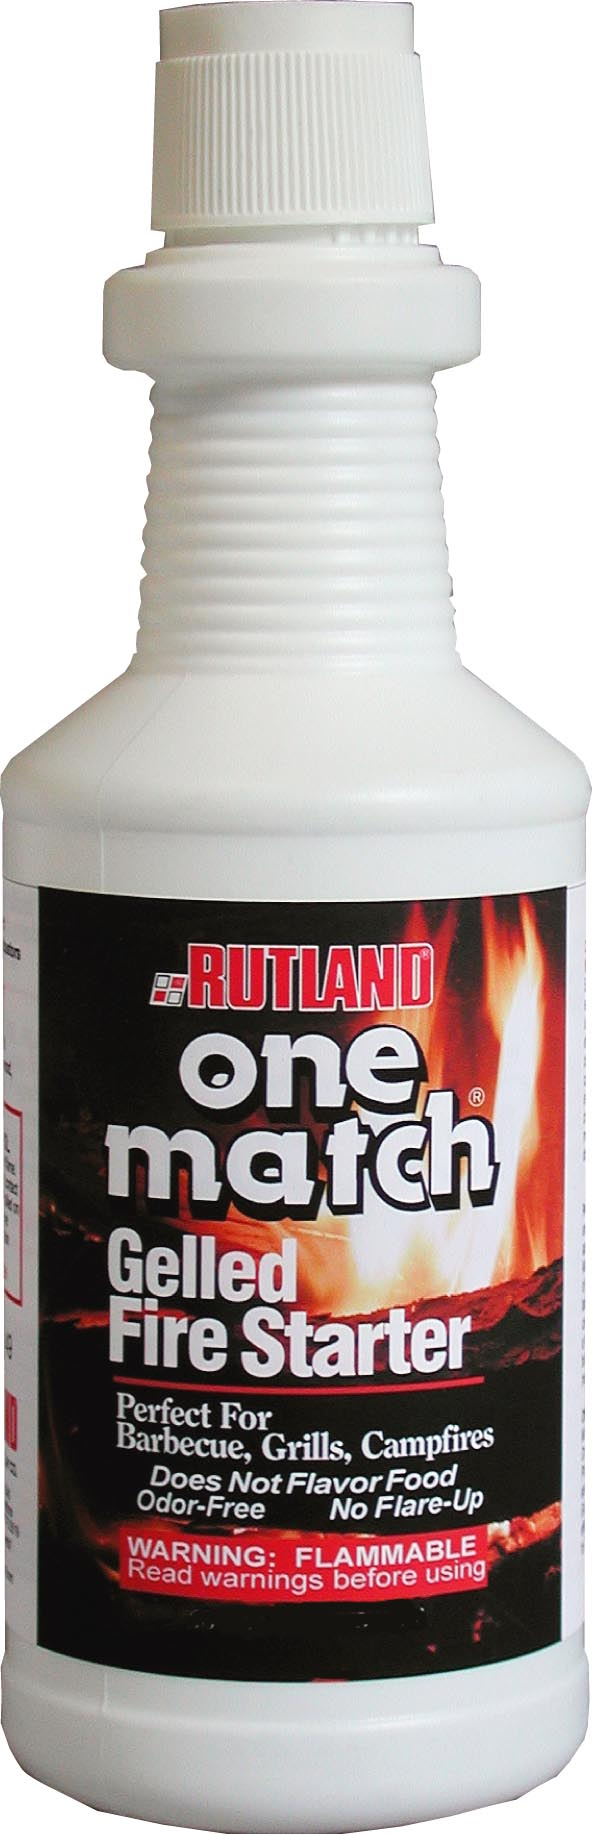 rutland fire starters